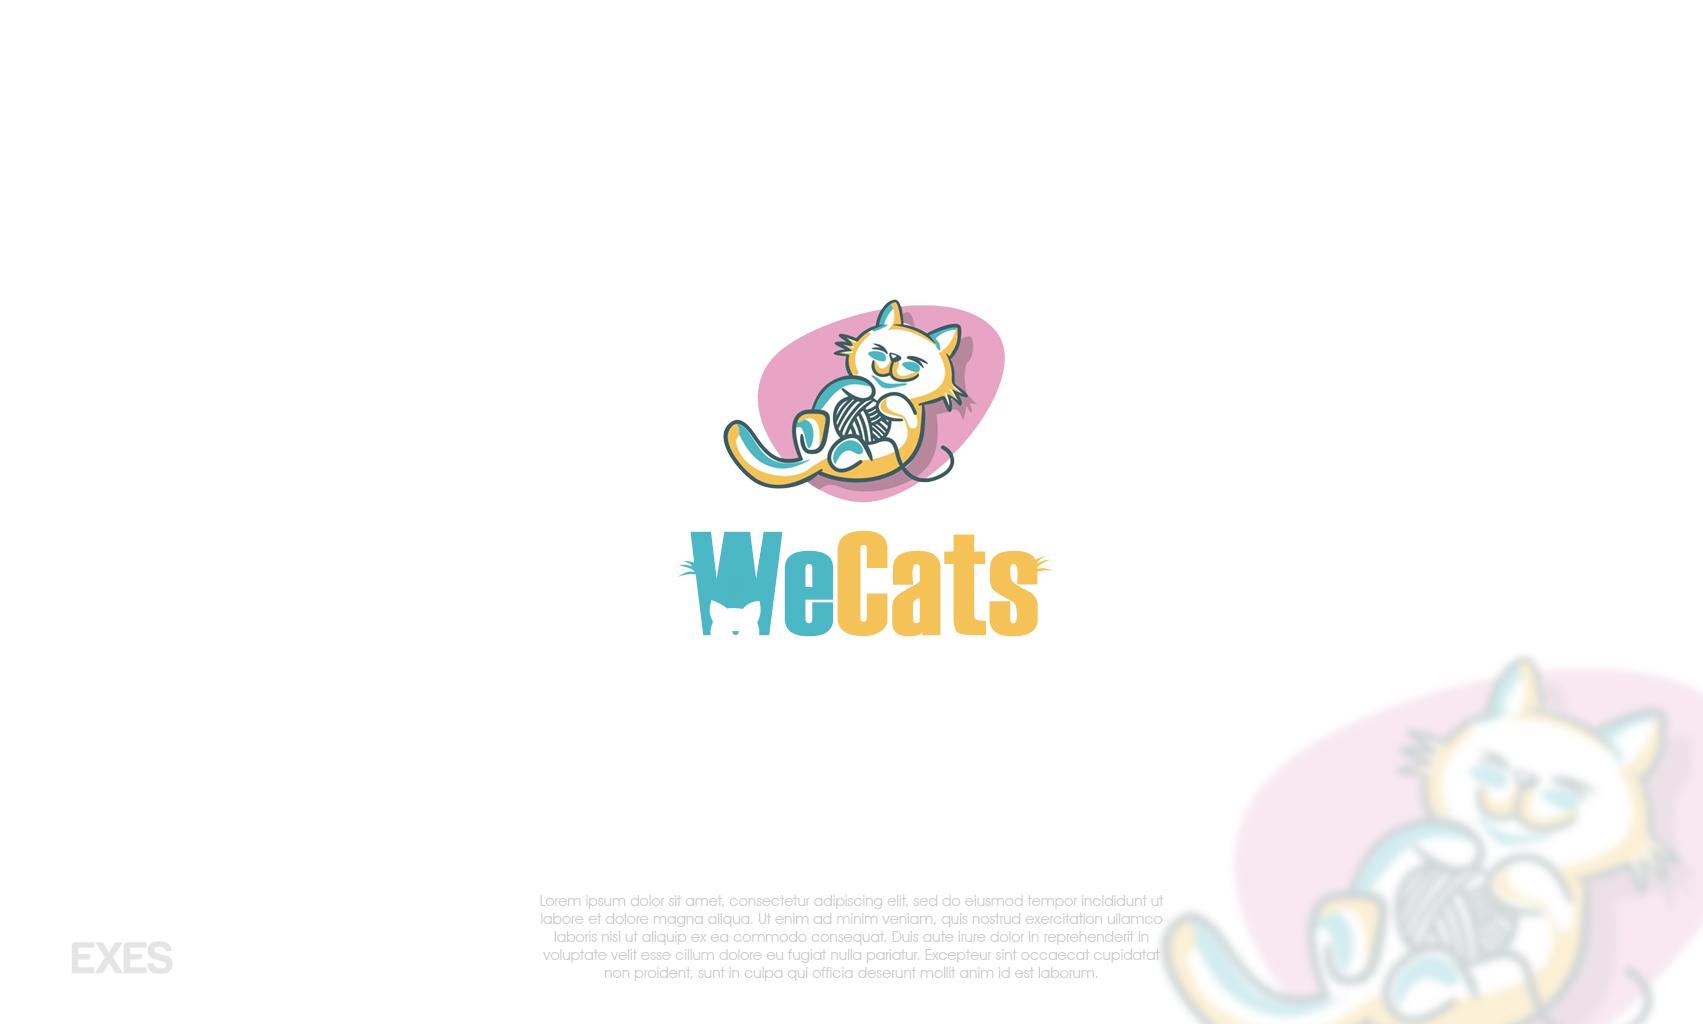 Создание логотипа WeCats фото f_7595f1af8a03b591.jpg